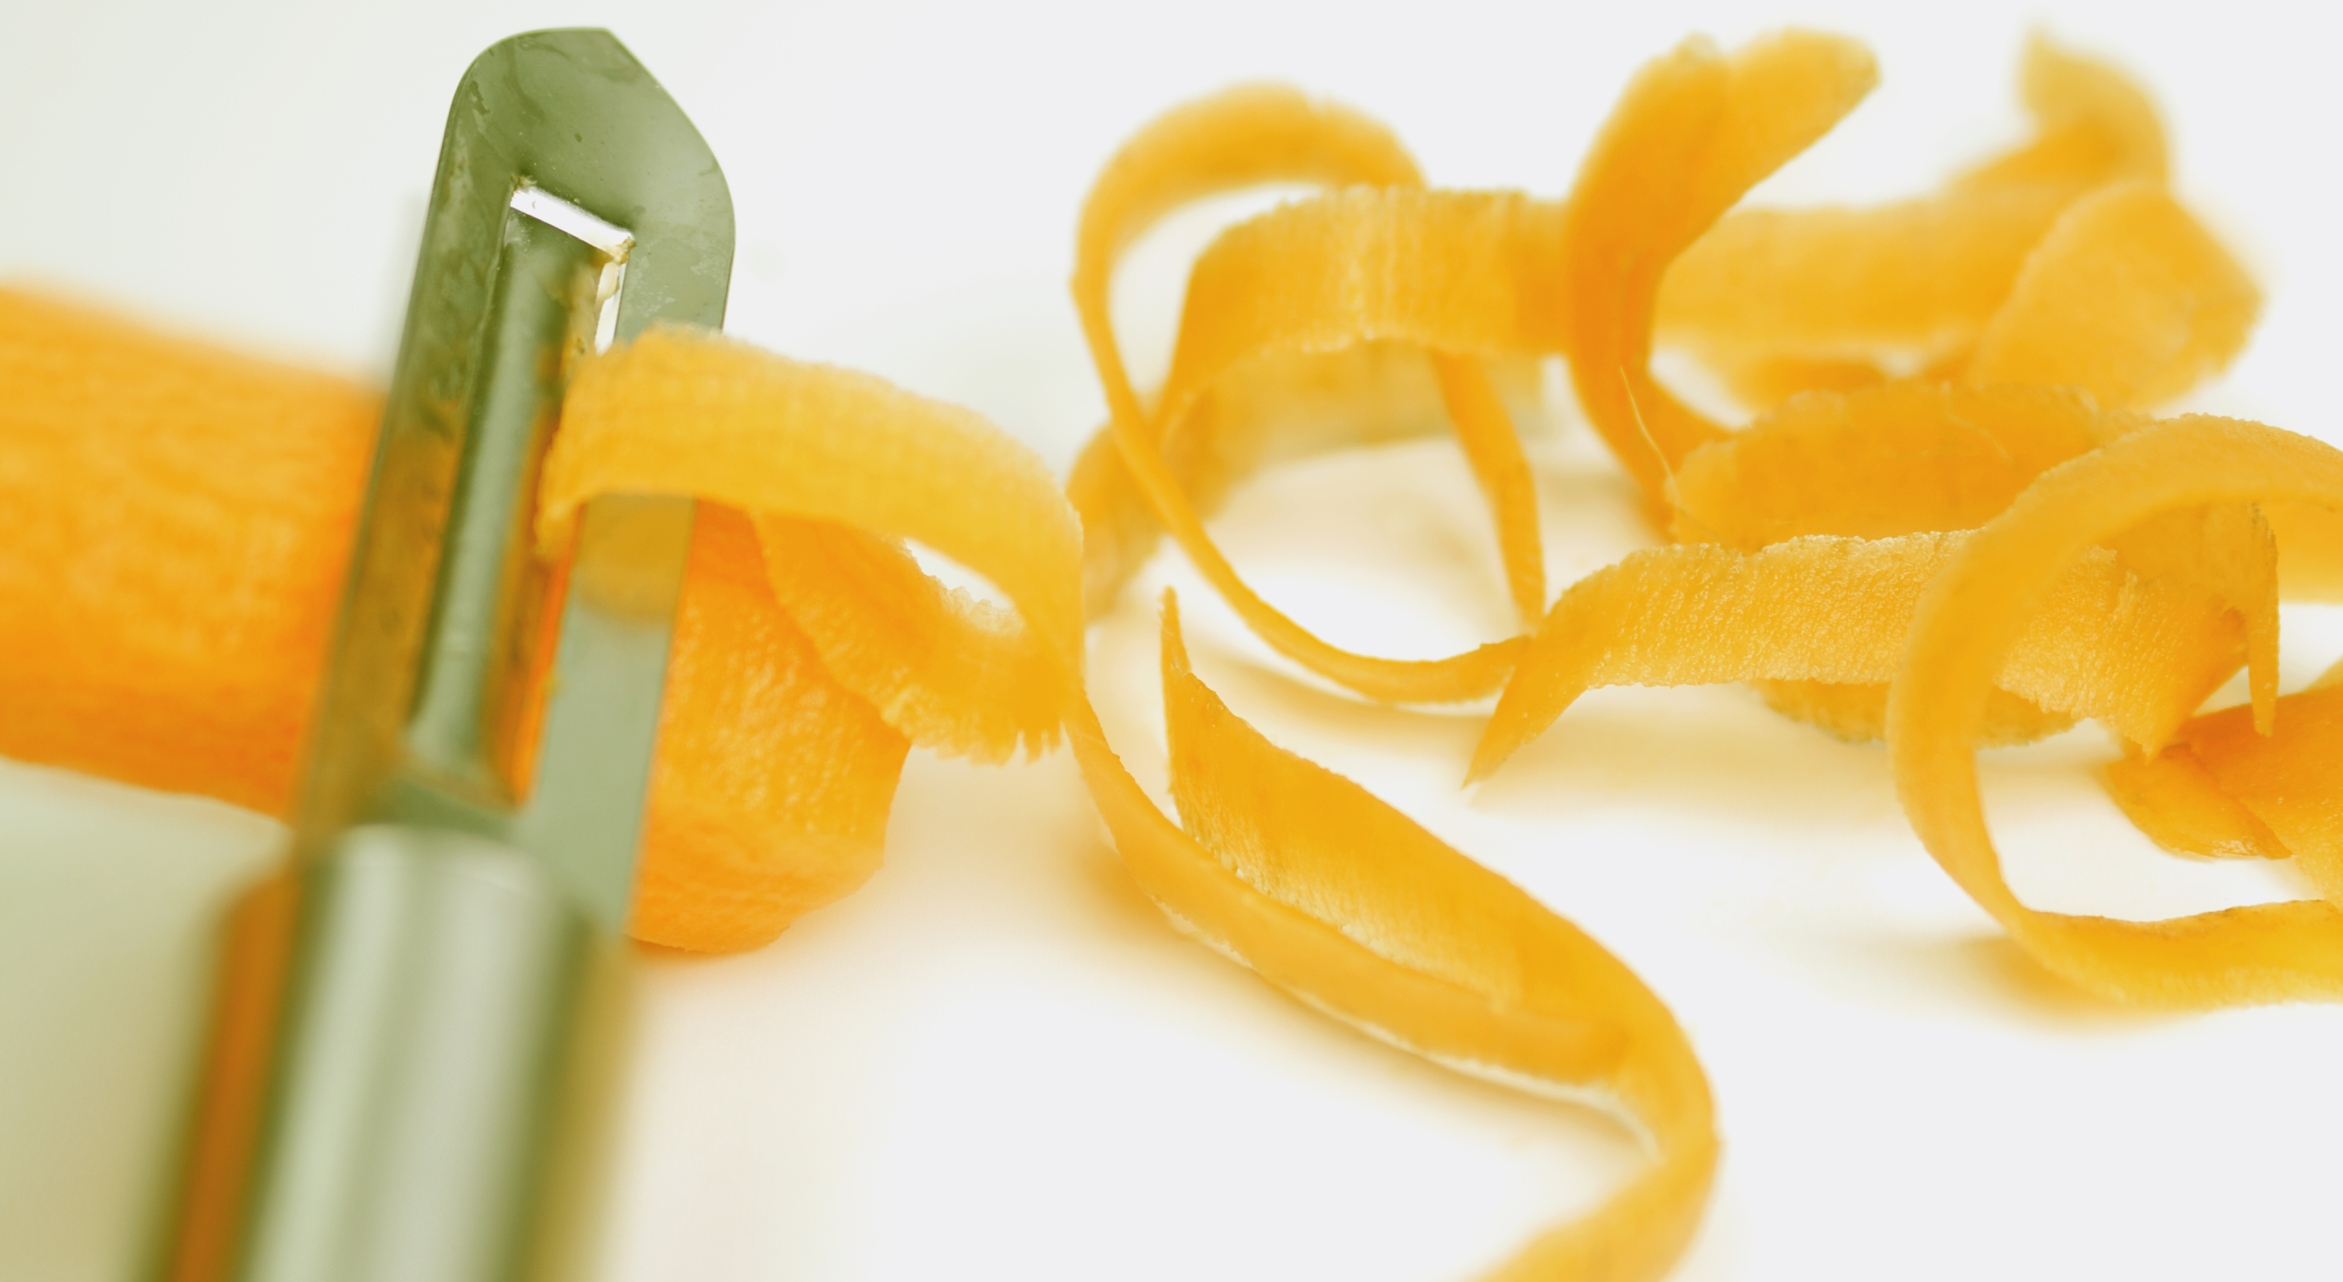 Fruit and Vegetable Poisoning - Dangerous Vitamins 1